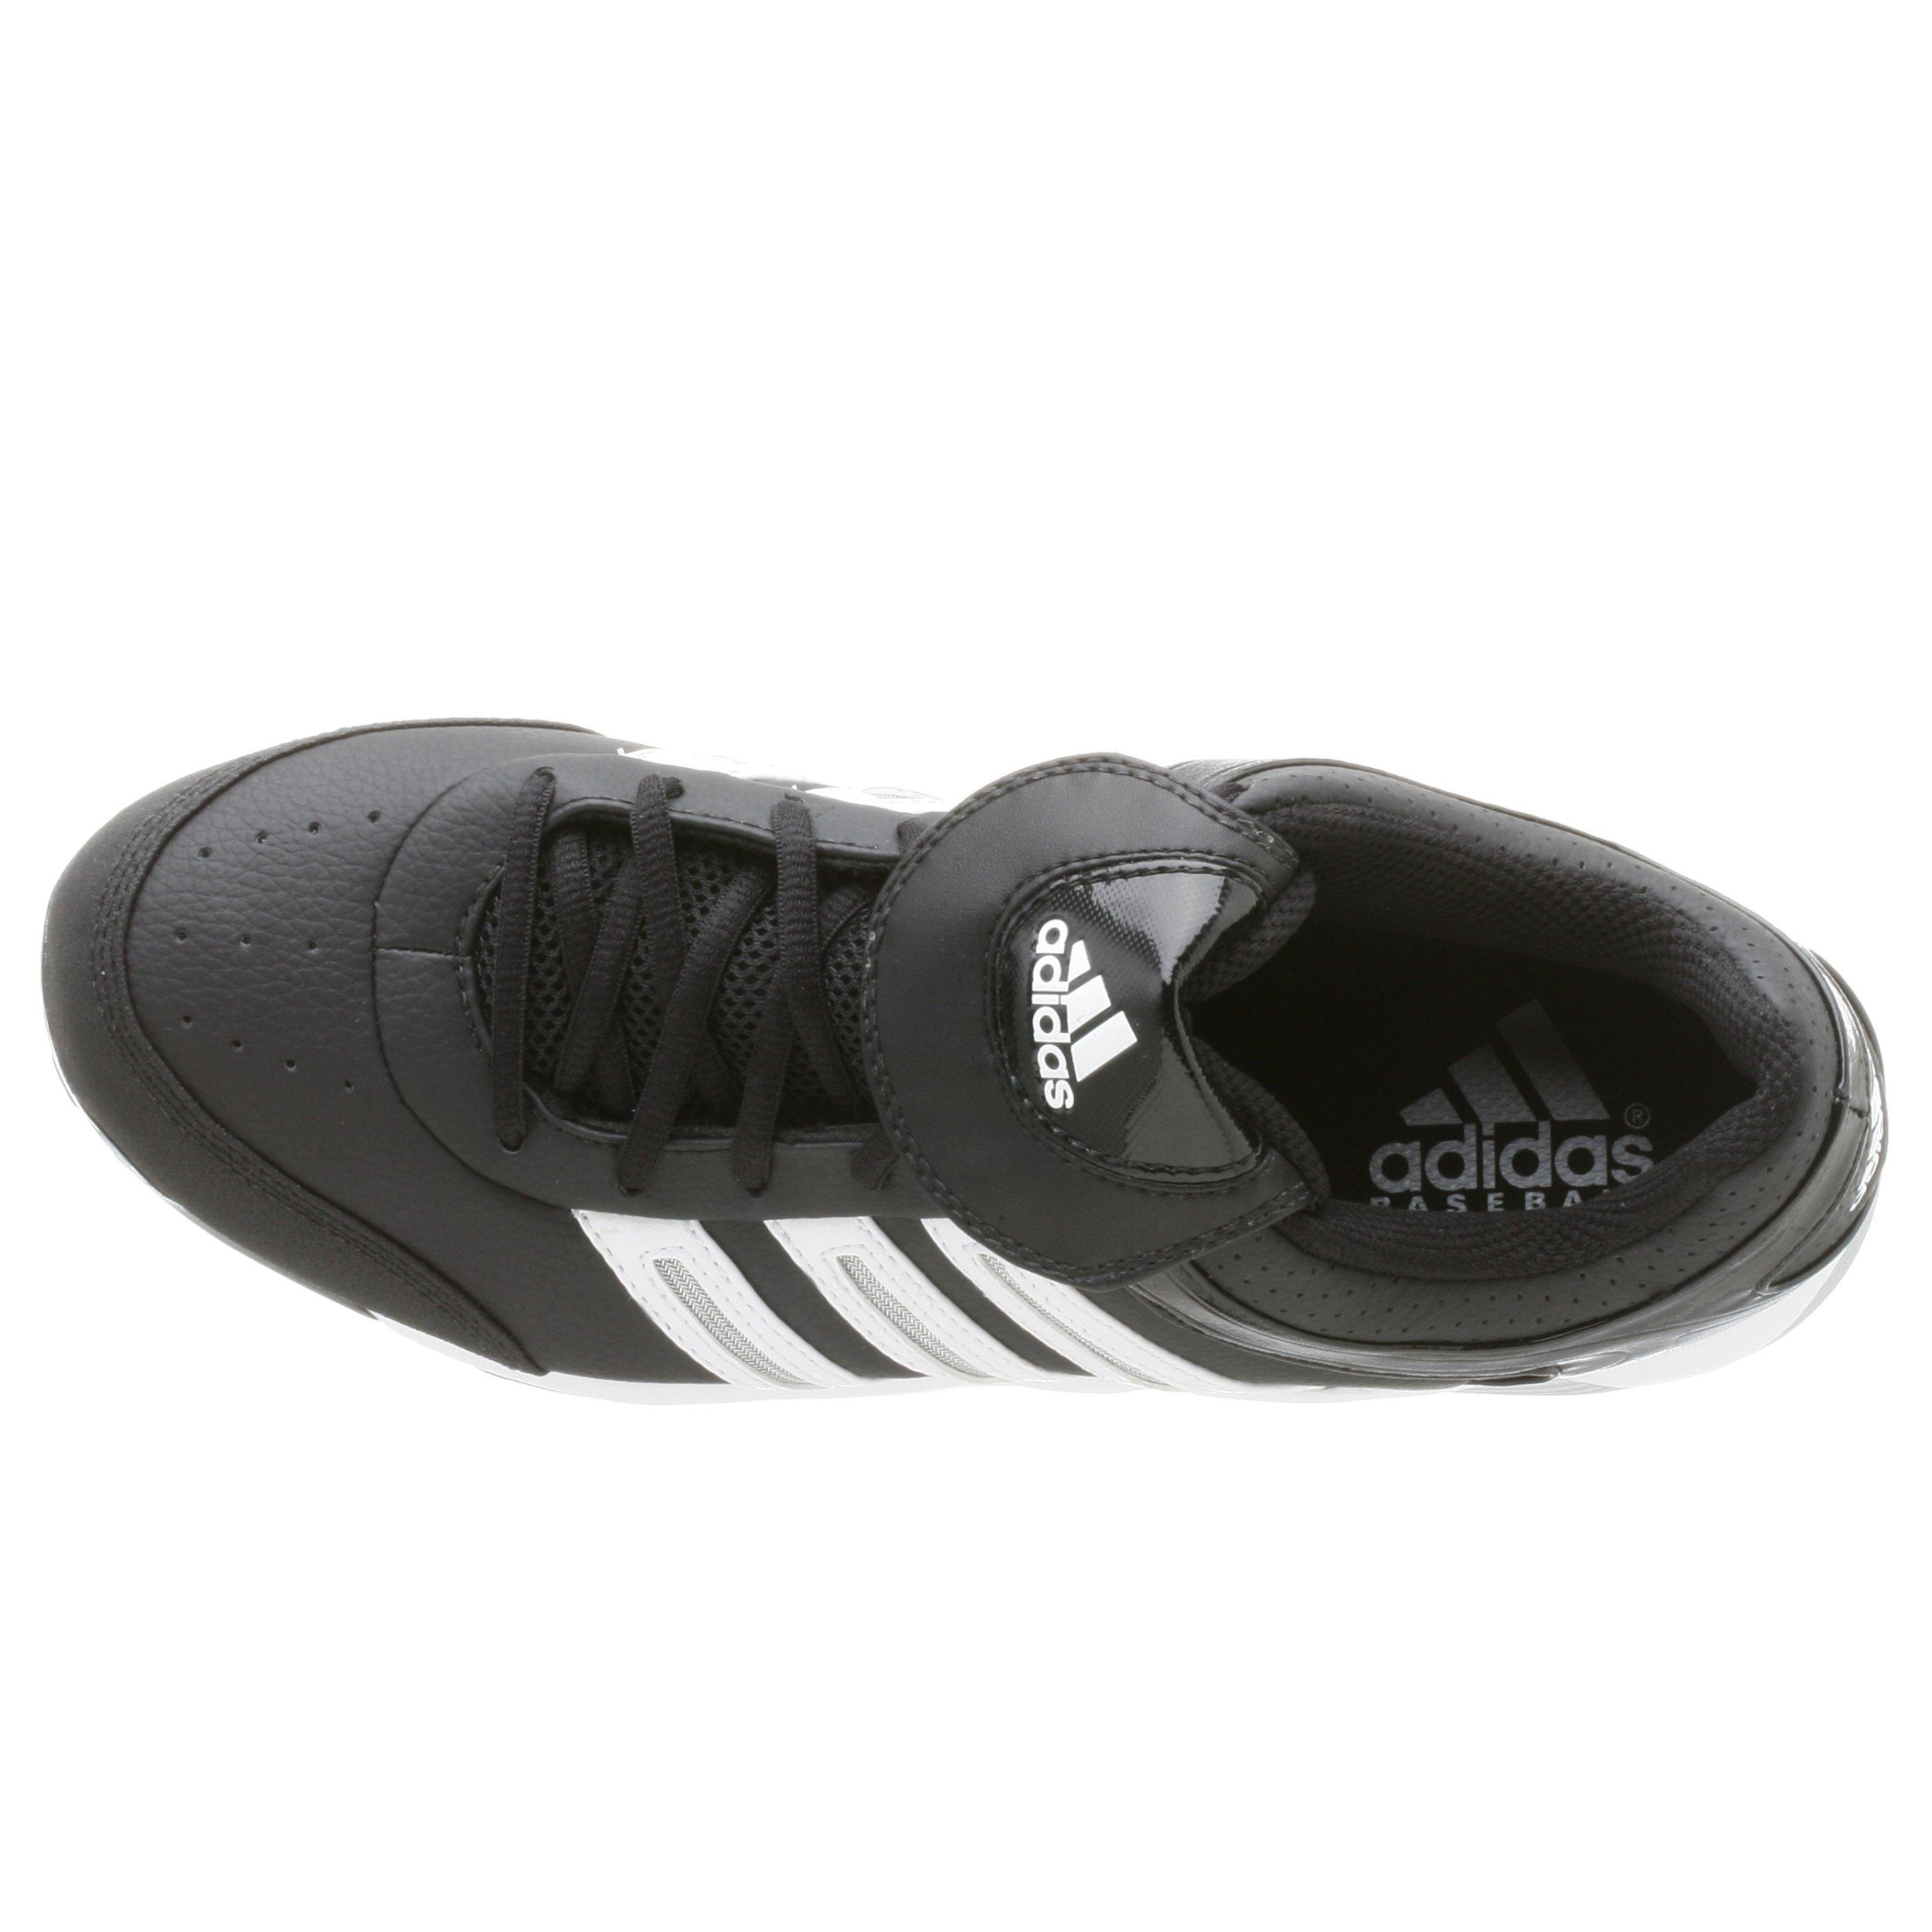 adidas Men's Diamond King Low Baseball Shoe,Blk/Runwht/Metsil,9.5 M by adidas (Image #8)